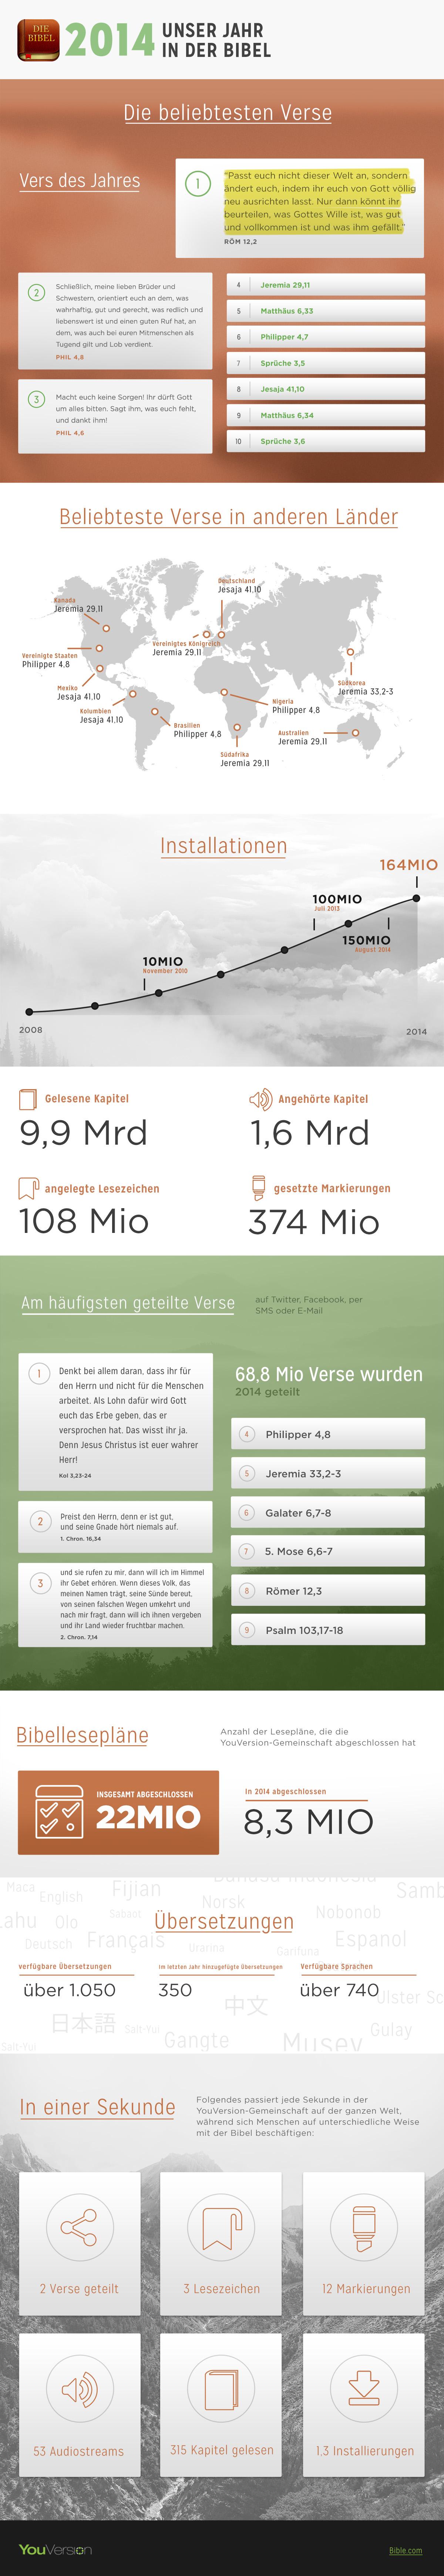 2014-Infographic-German